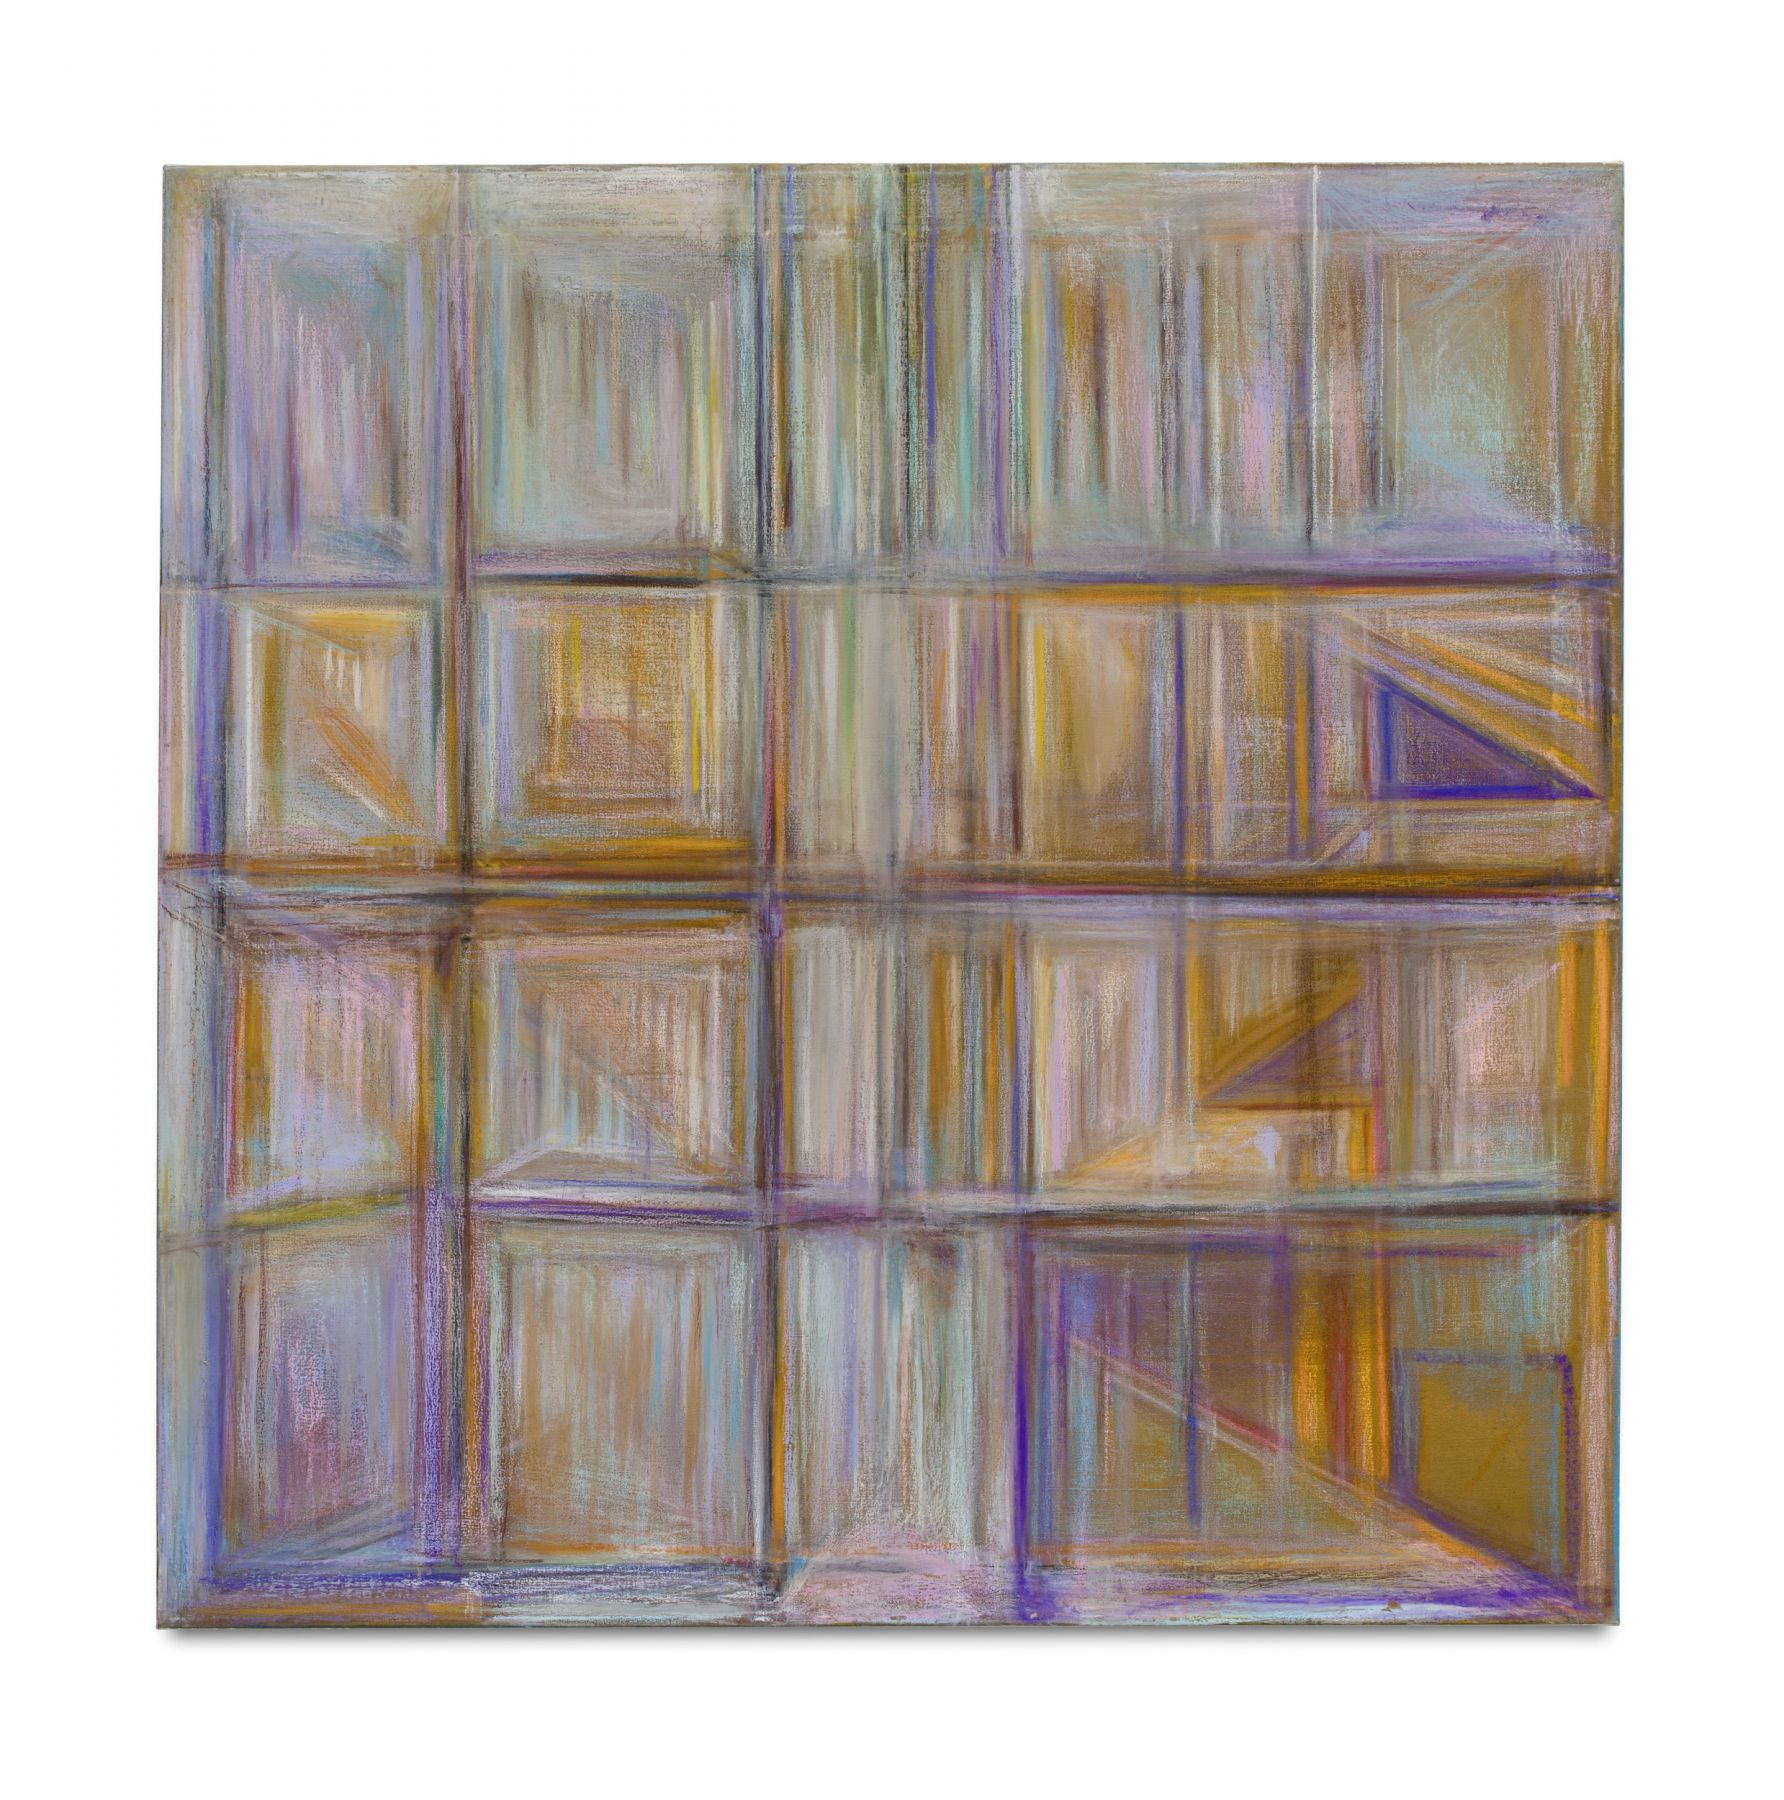 Hedda Sterne Untitled, c. 1989